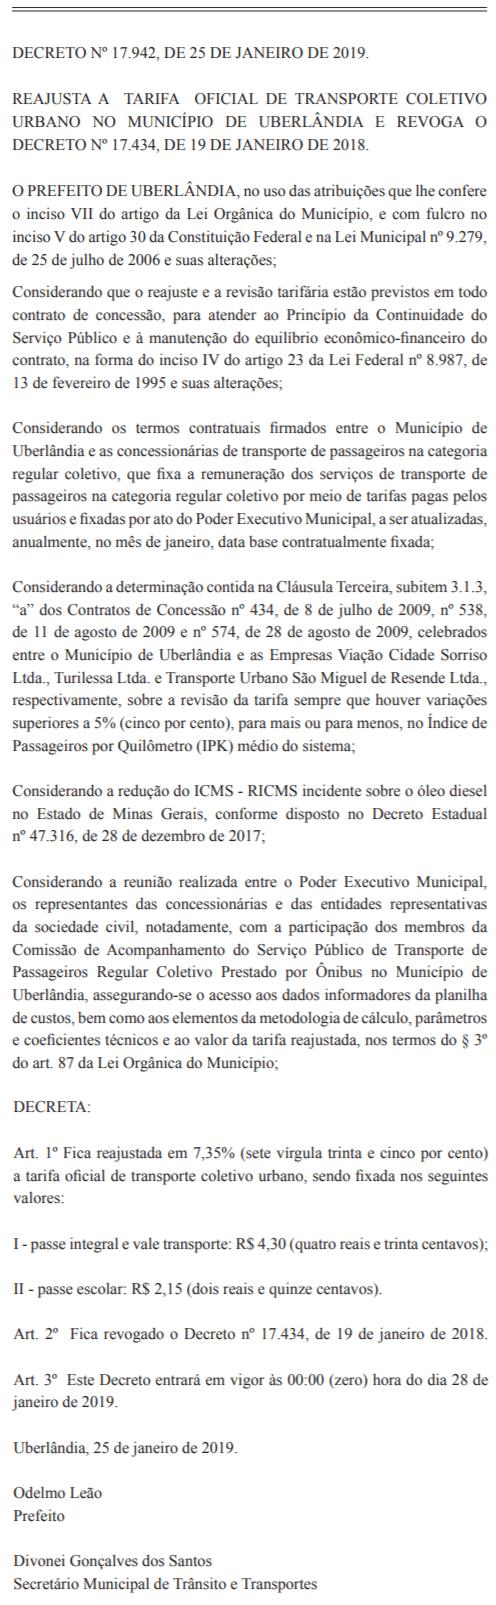 decreto_uberlandia